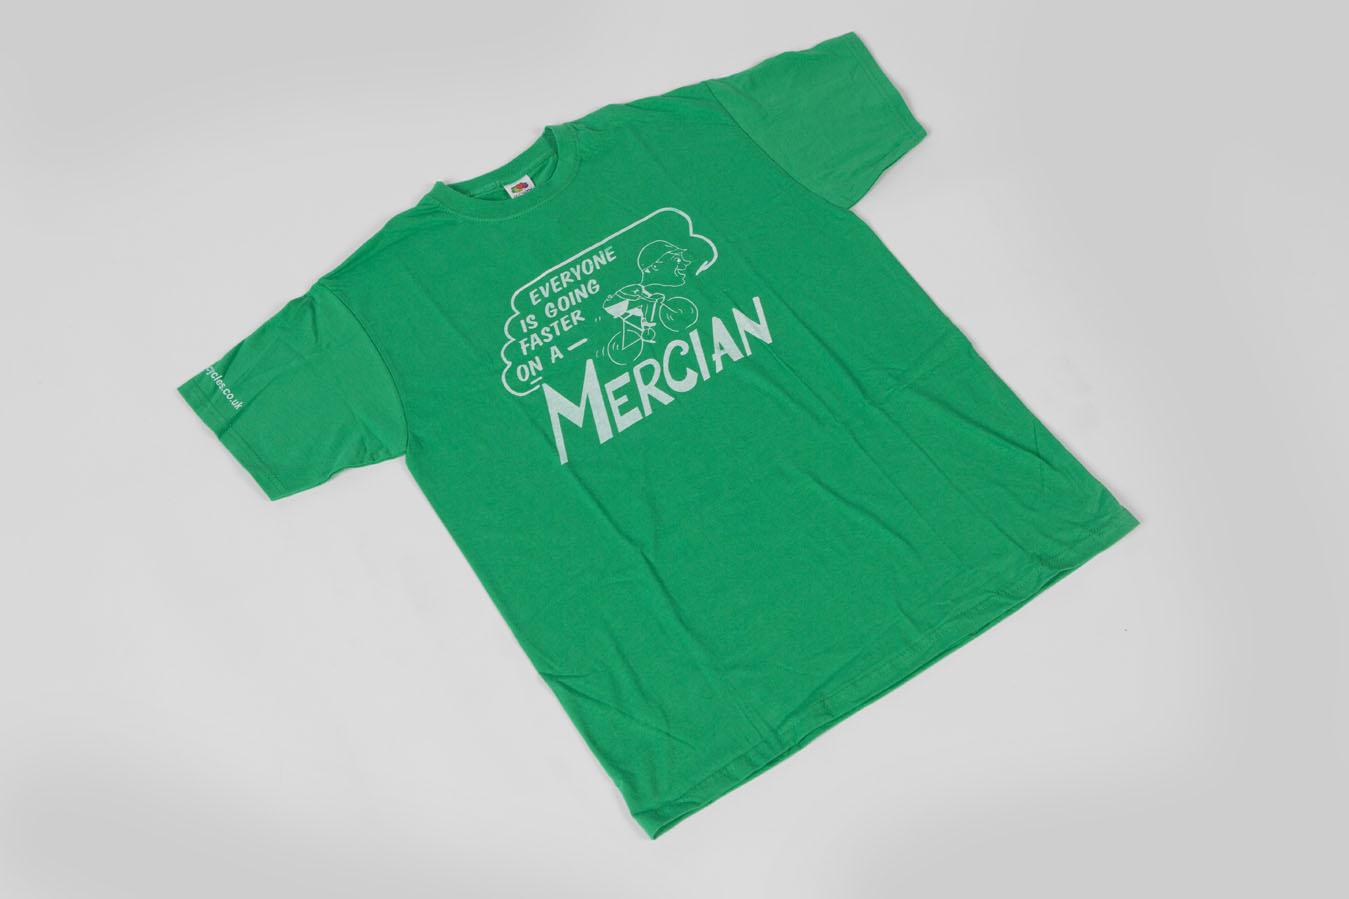 Mercian Screen Printed T-shirt